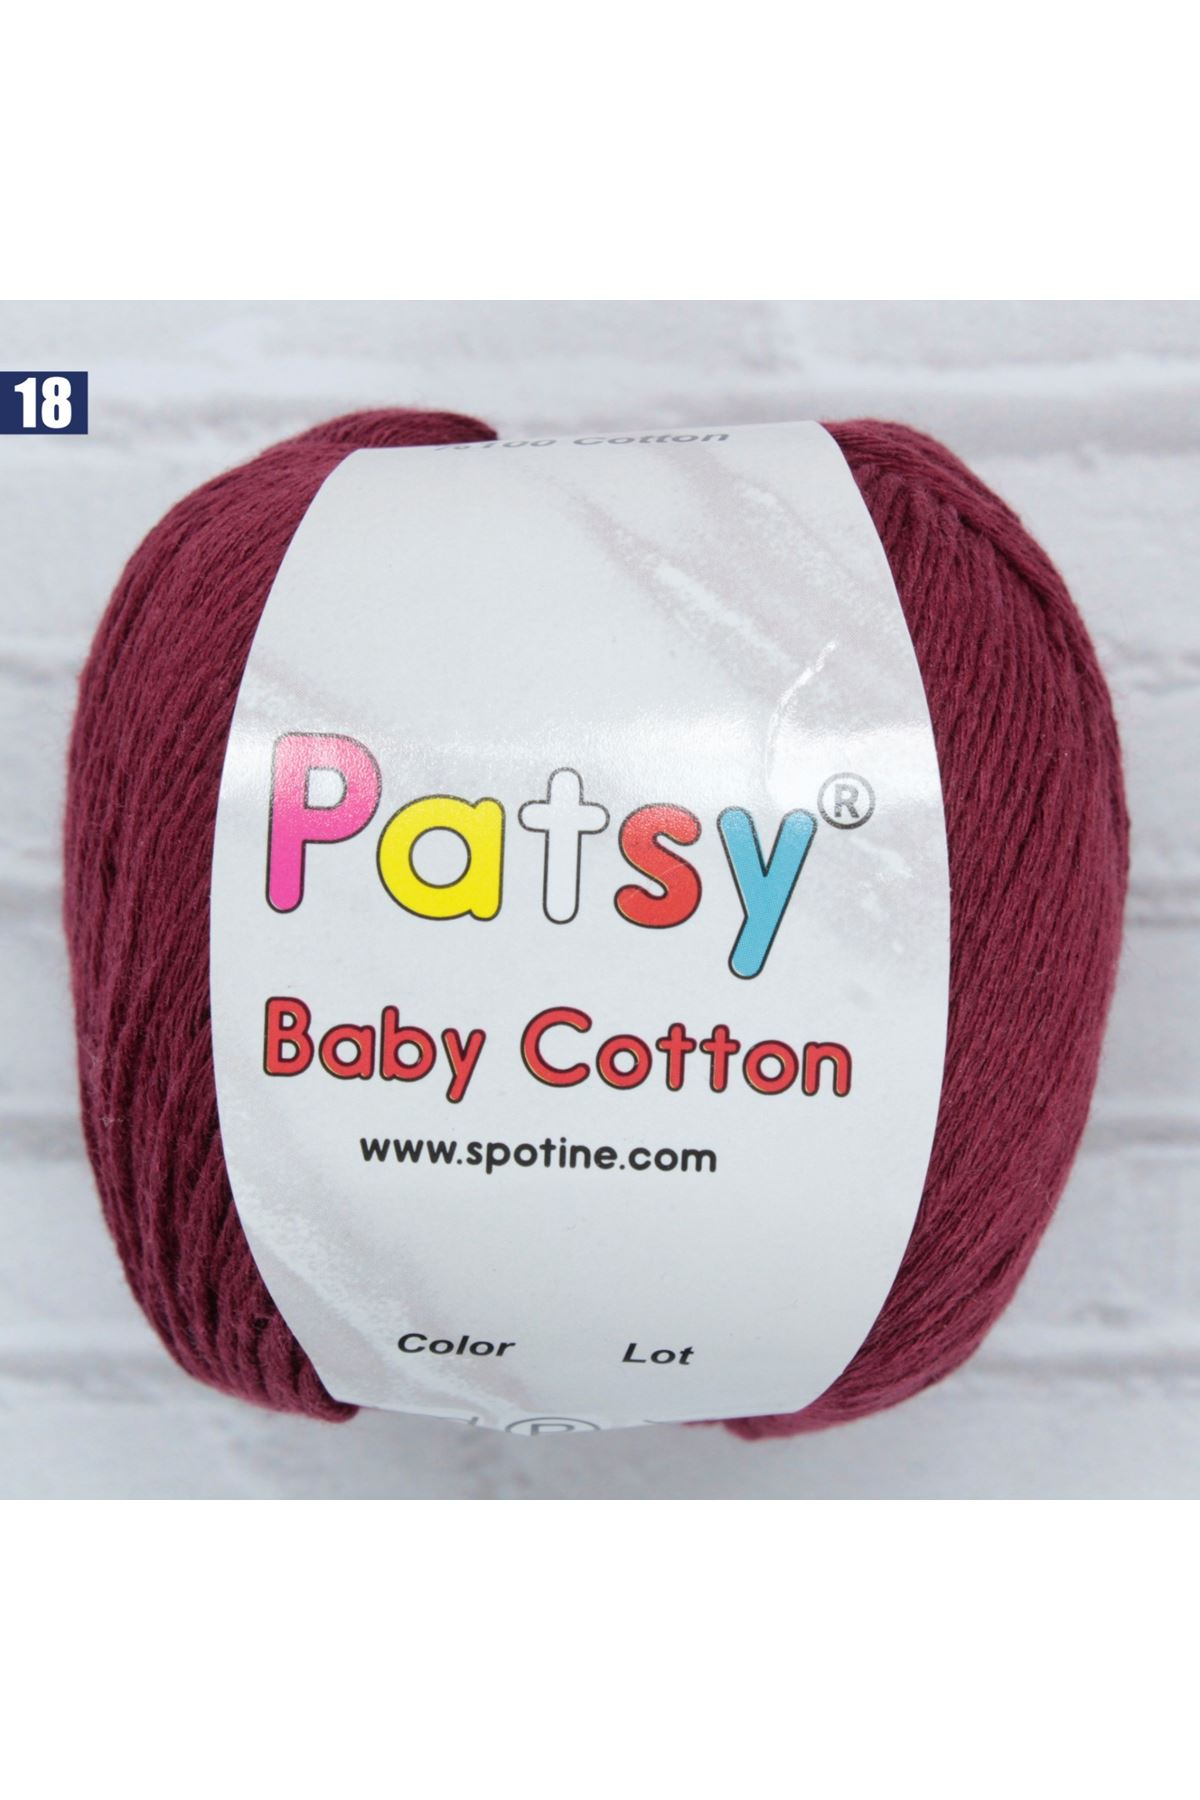 Patsy Baby Cotton 18